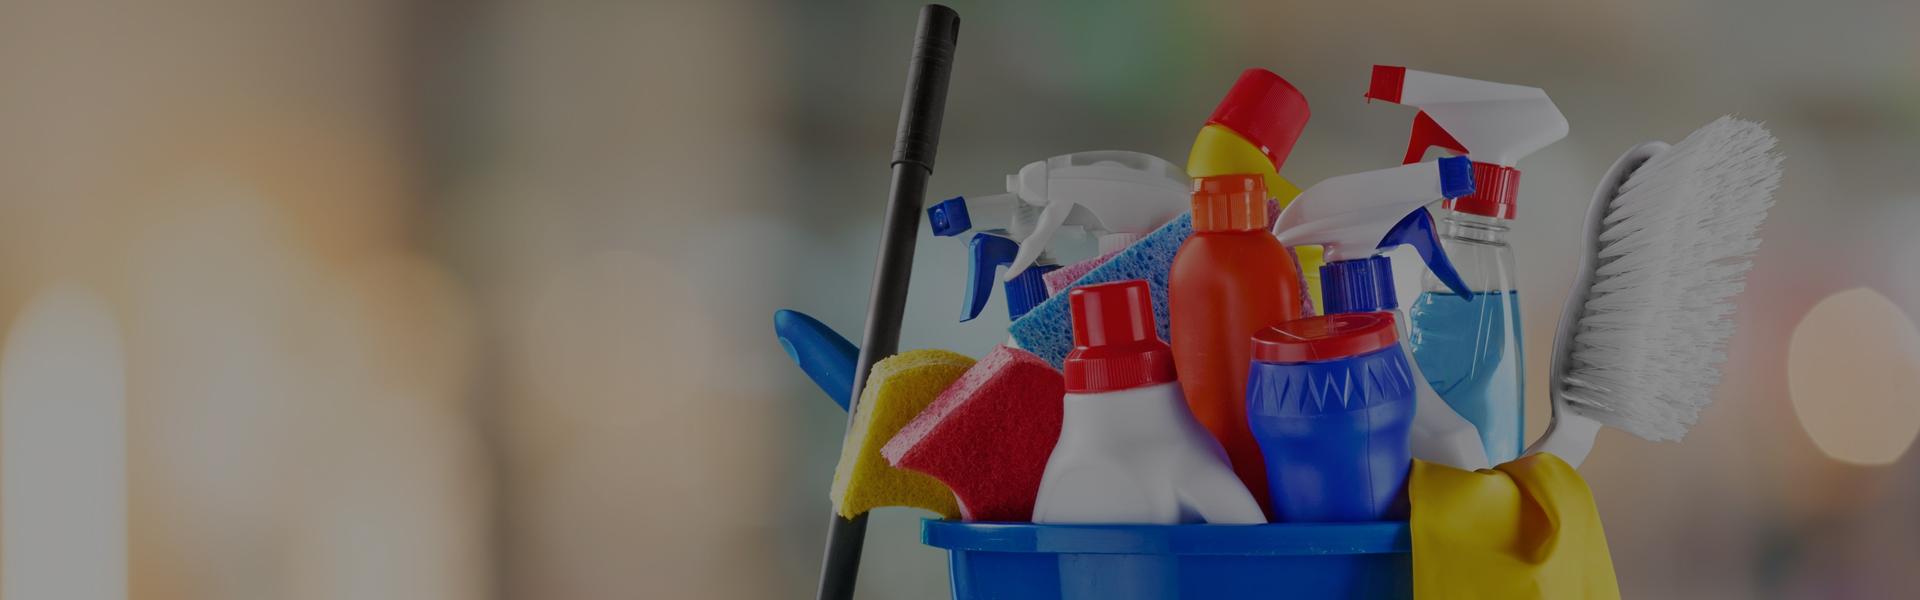 BESTWAY CLEANING SERVICES PTE LTD